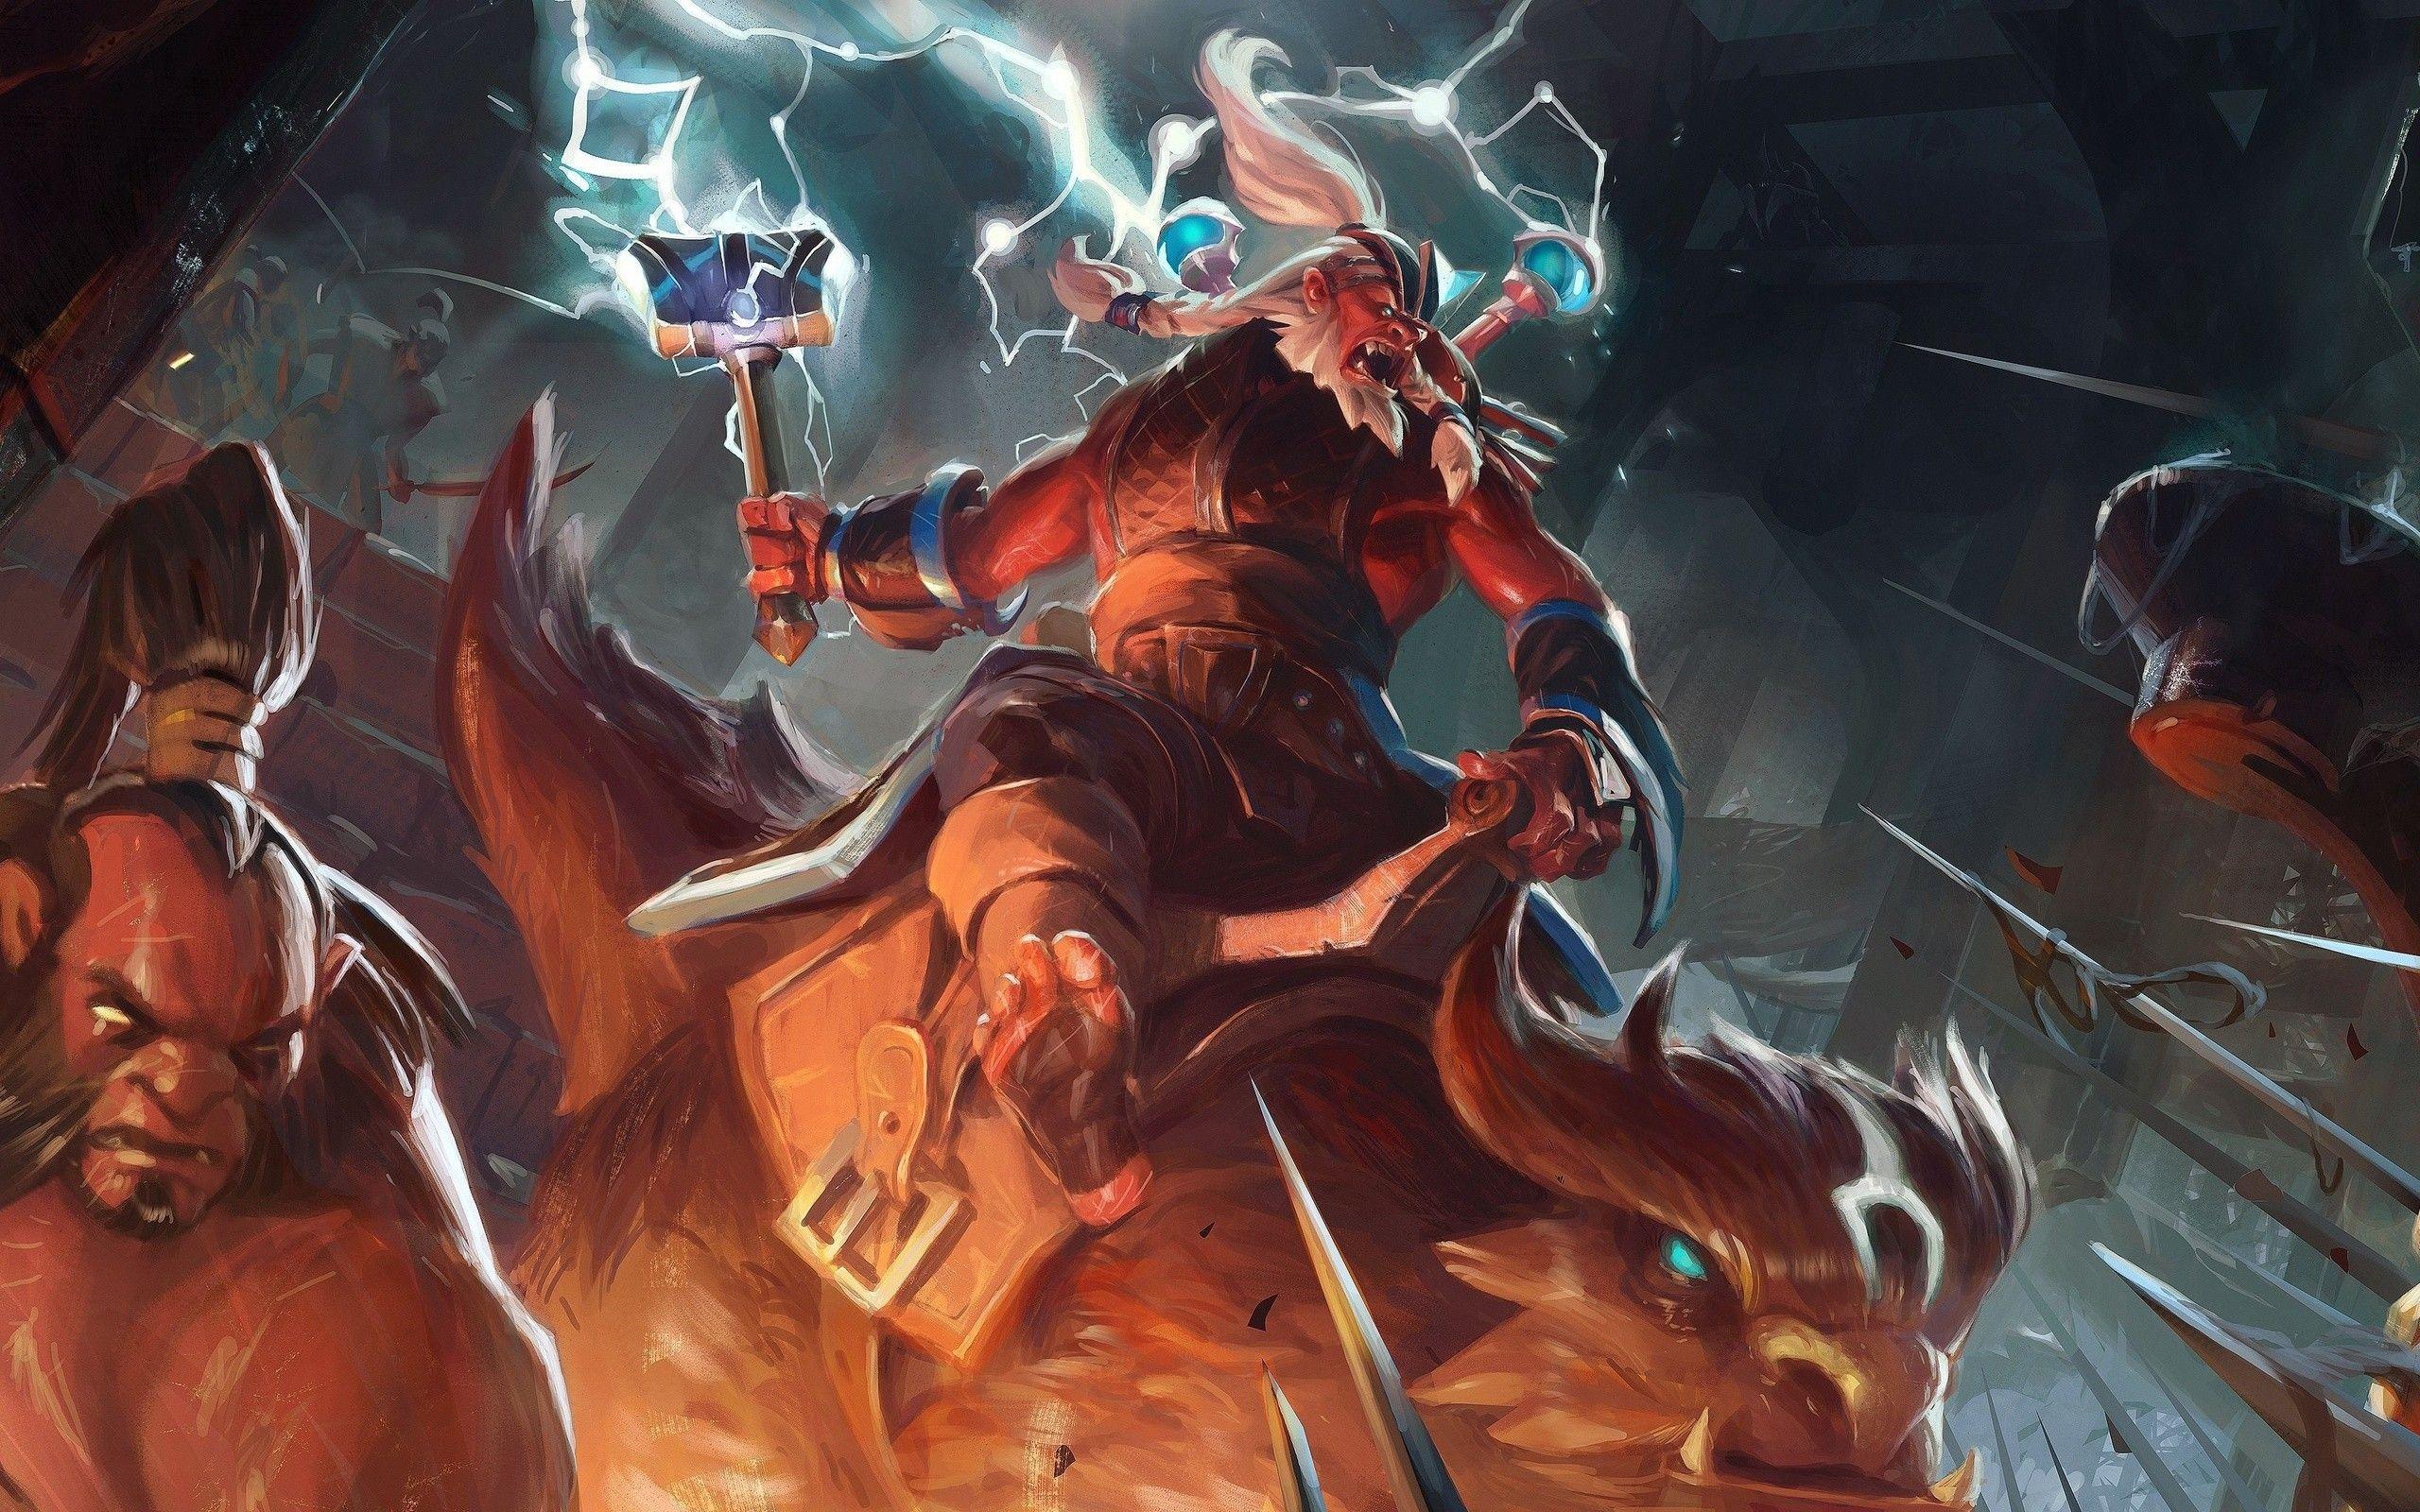 Google themes dota 2 - Axe Hero Dota 2 Games Wallpaper